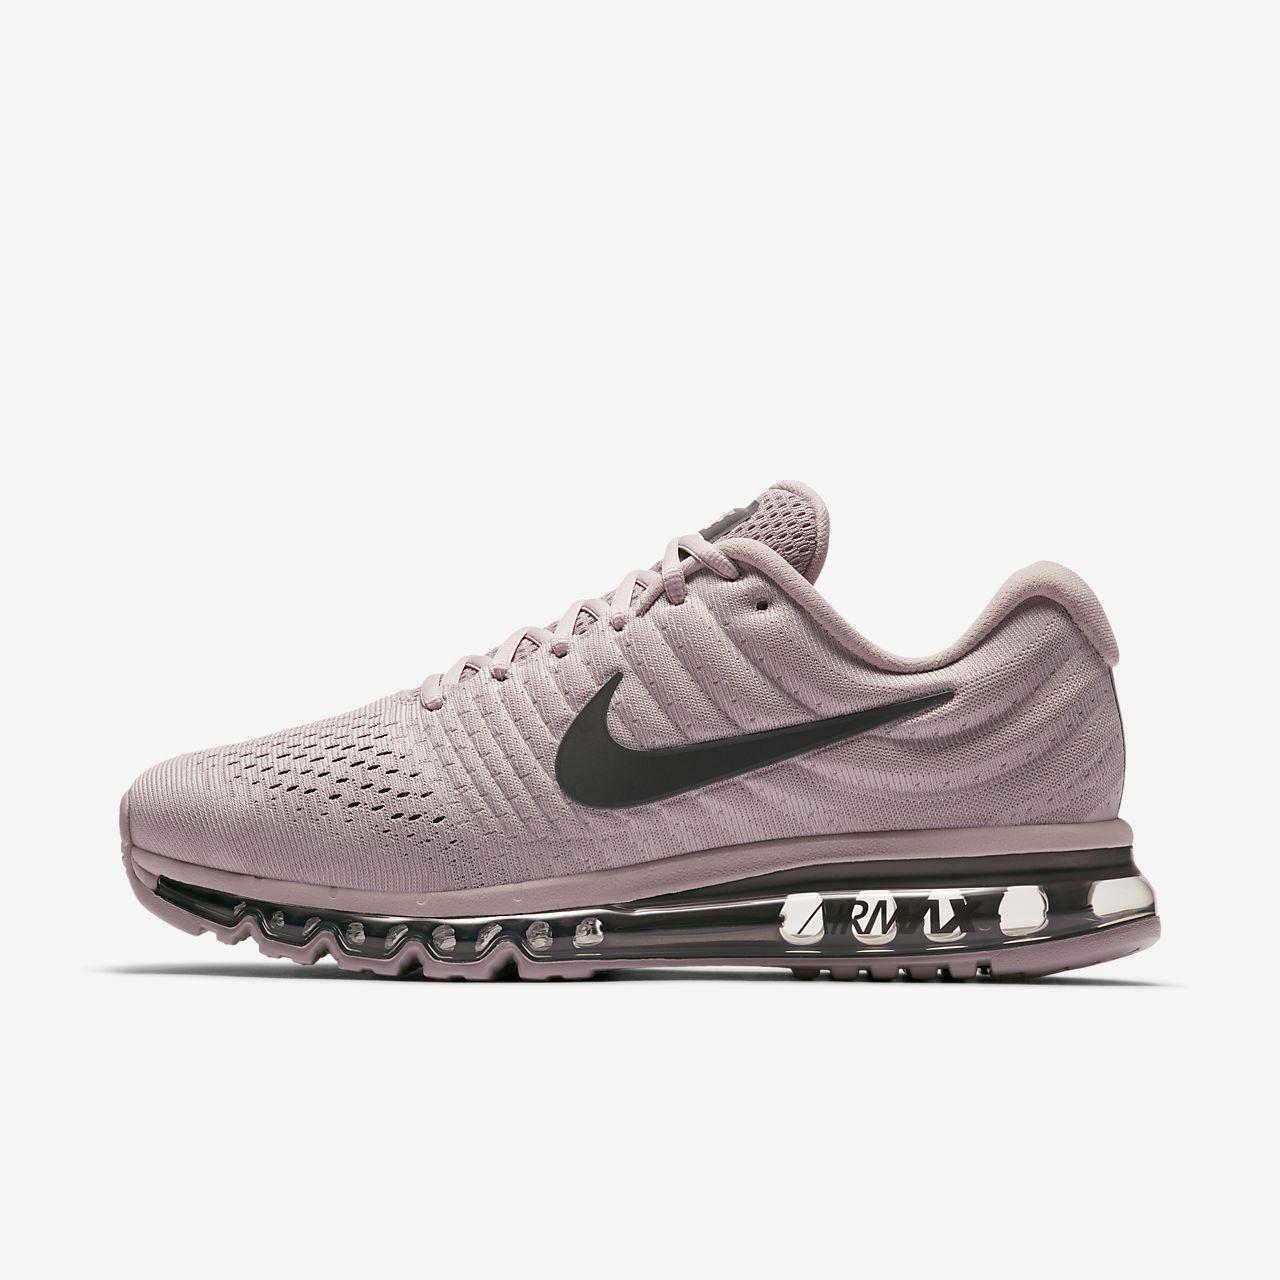 size 40 90c7c 3a2bc ... Scarpa Nike Air Max 2017 SE - Uomo